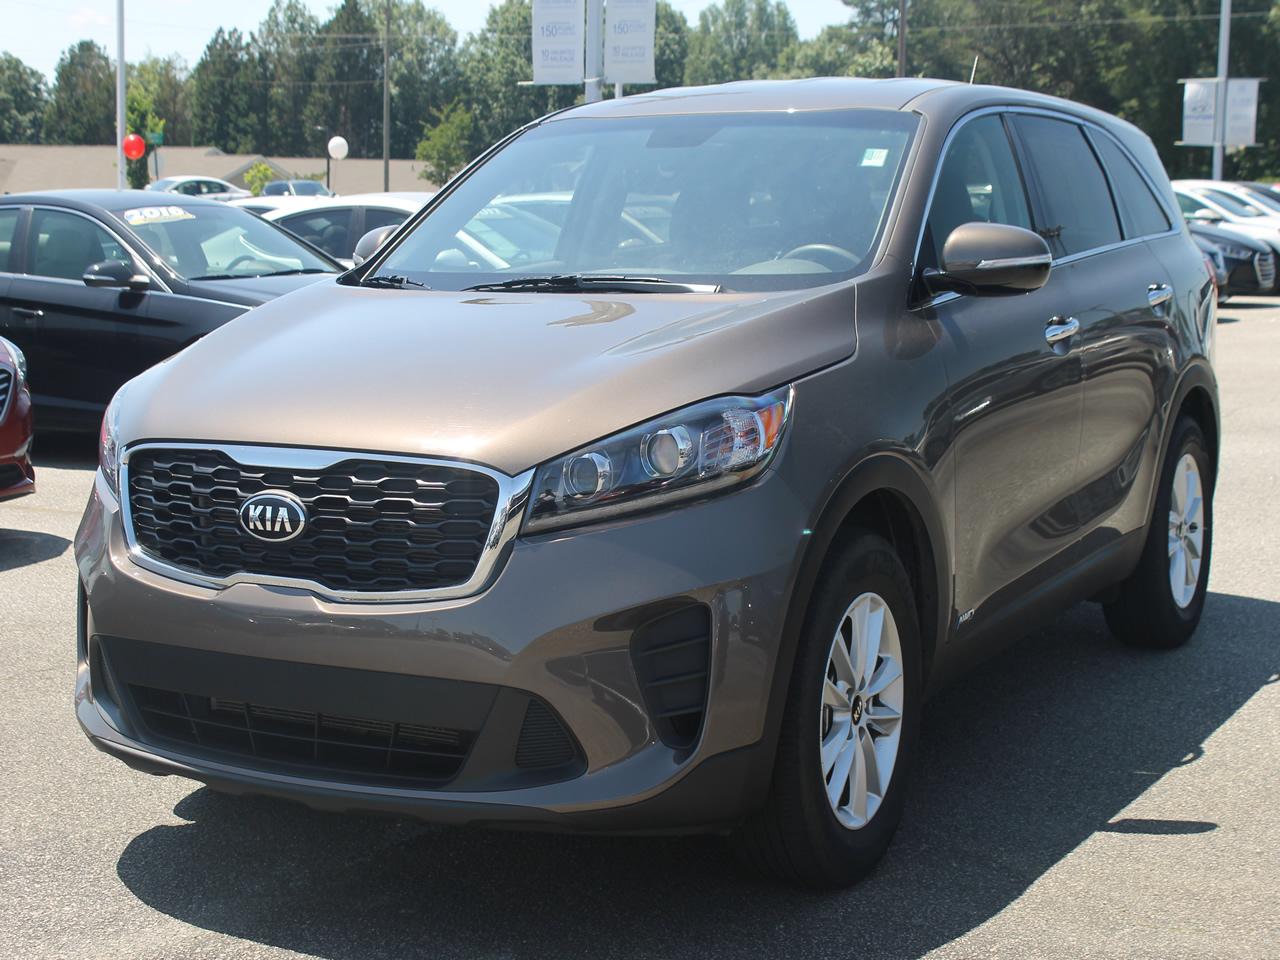 Dick Smith Hyundai >> USED 2019 KIA SORENTO LX AWD VIN 5XYPGDA51KG487296 - Hyundai in Greenville | Hyundai Anderson ...